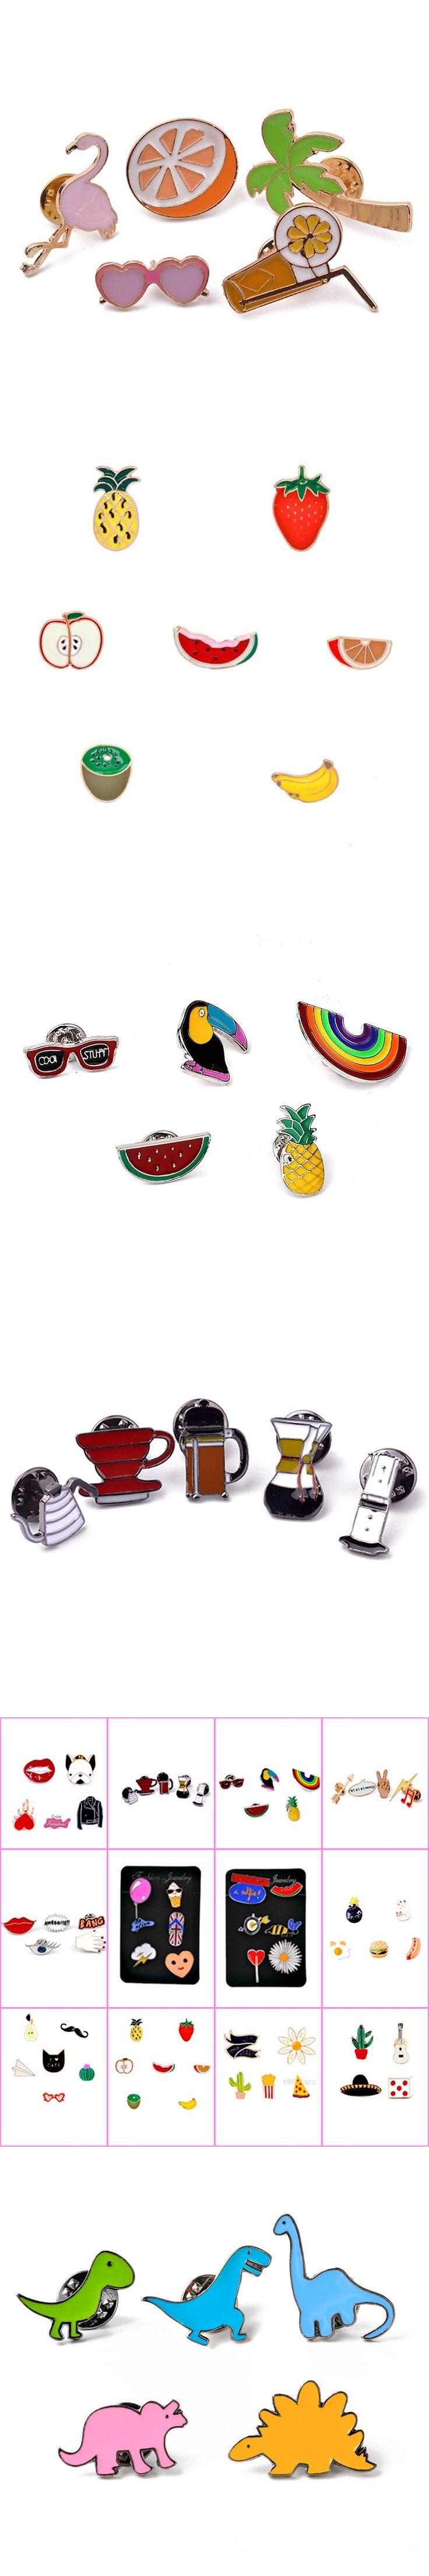 4-7 PCS/Set Cartoon Brooch Pin Enamel Cute Animal Fruit Pear Ice Cream Shirt Lapel Pin Collar For Women Girl Scarf Pins Brooches